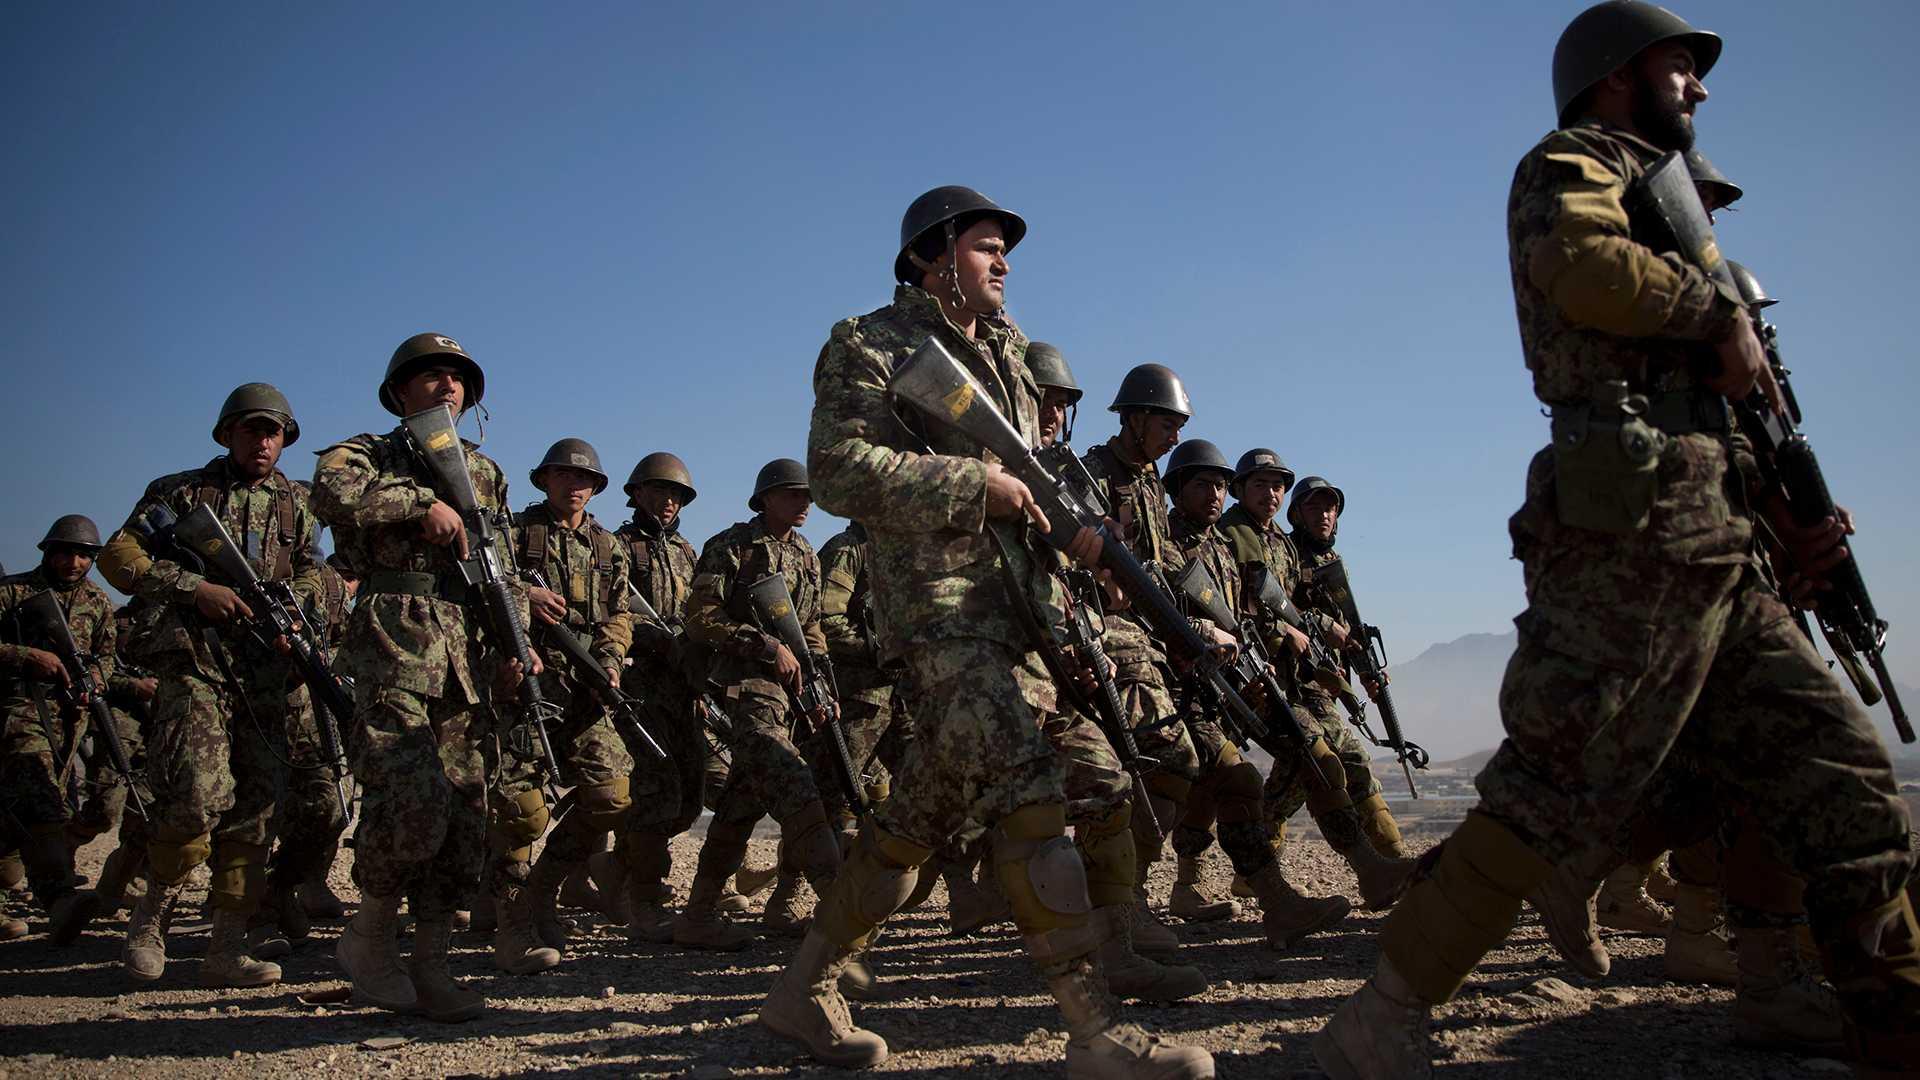 nat 36 thousand u s troops - HD1484×1038